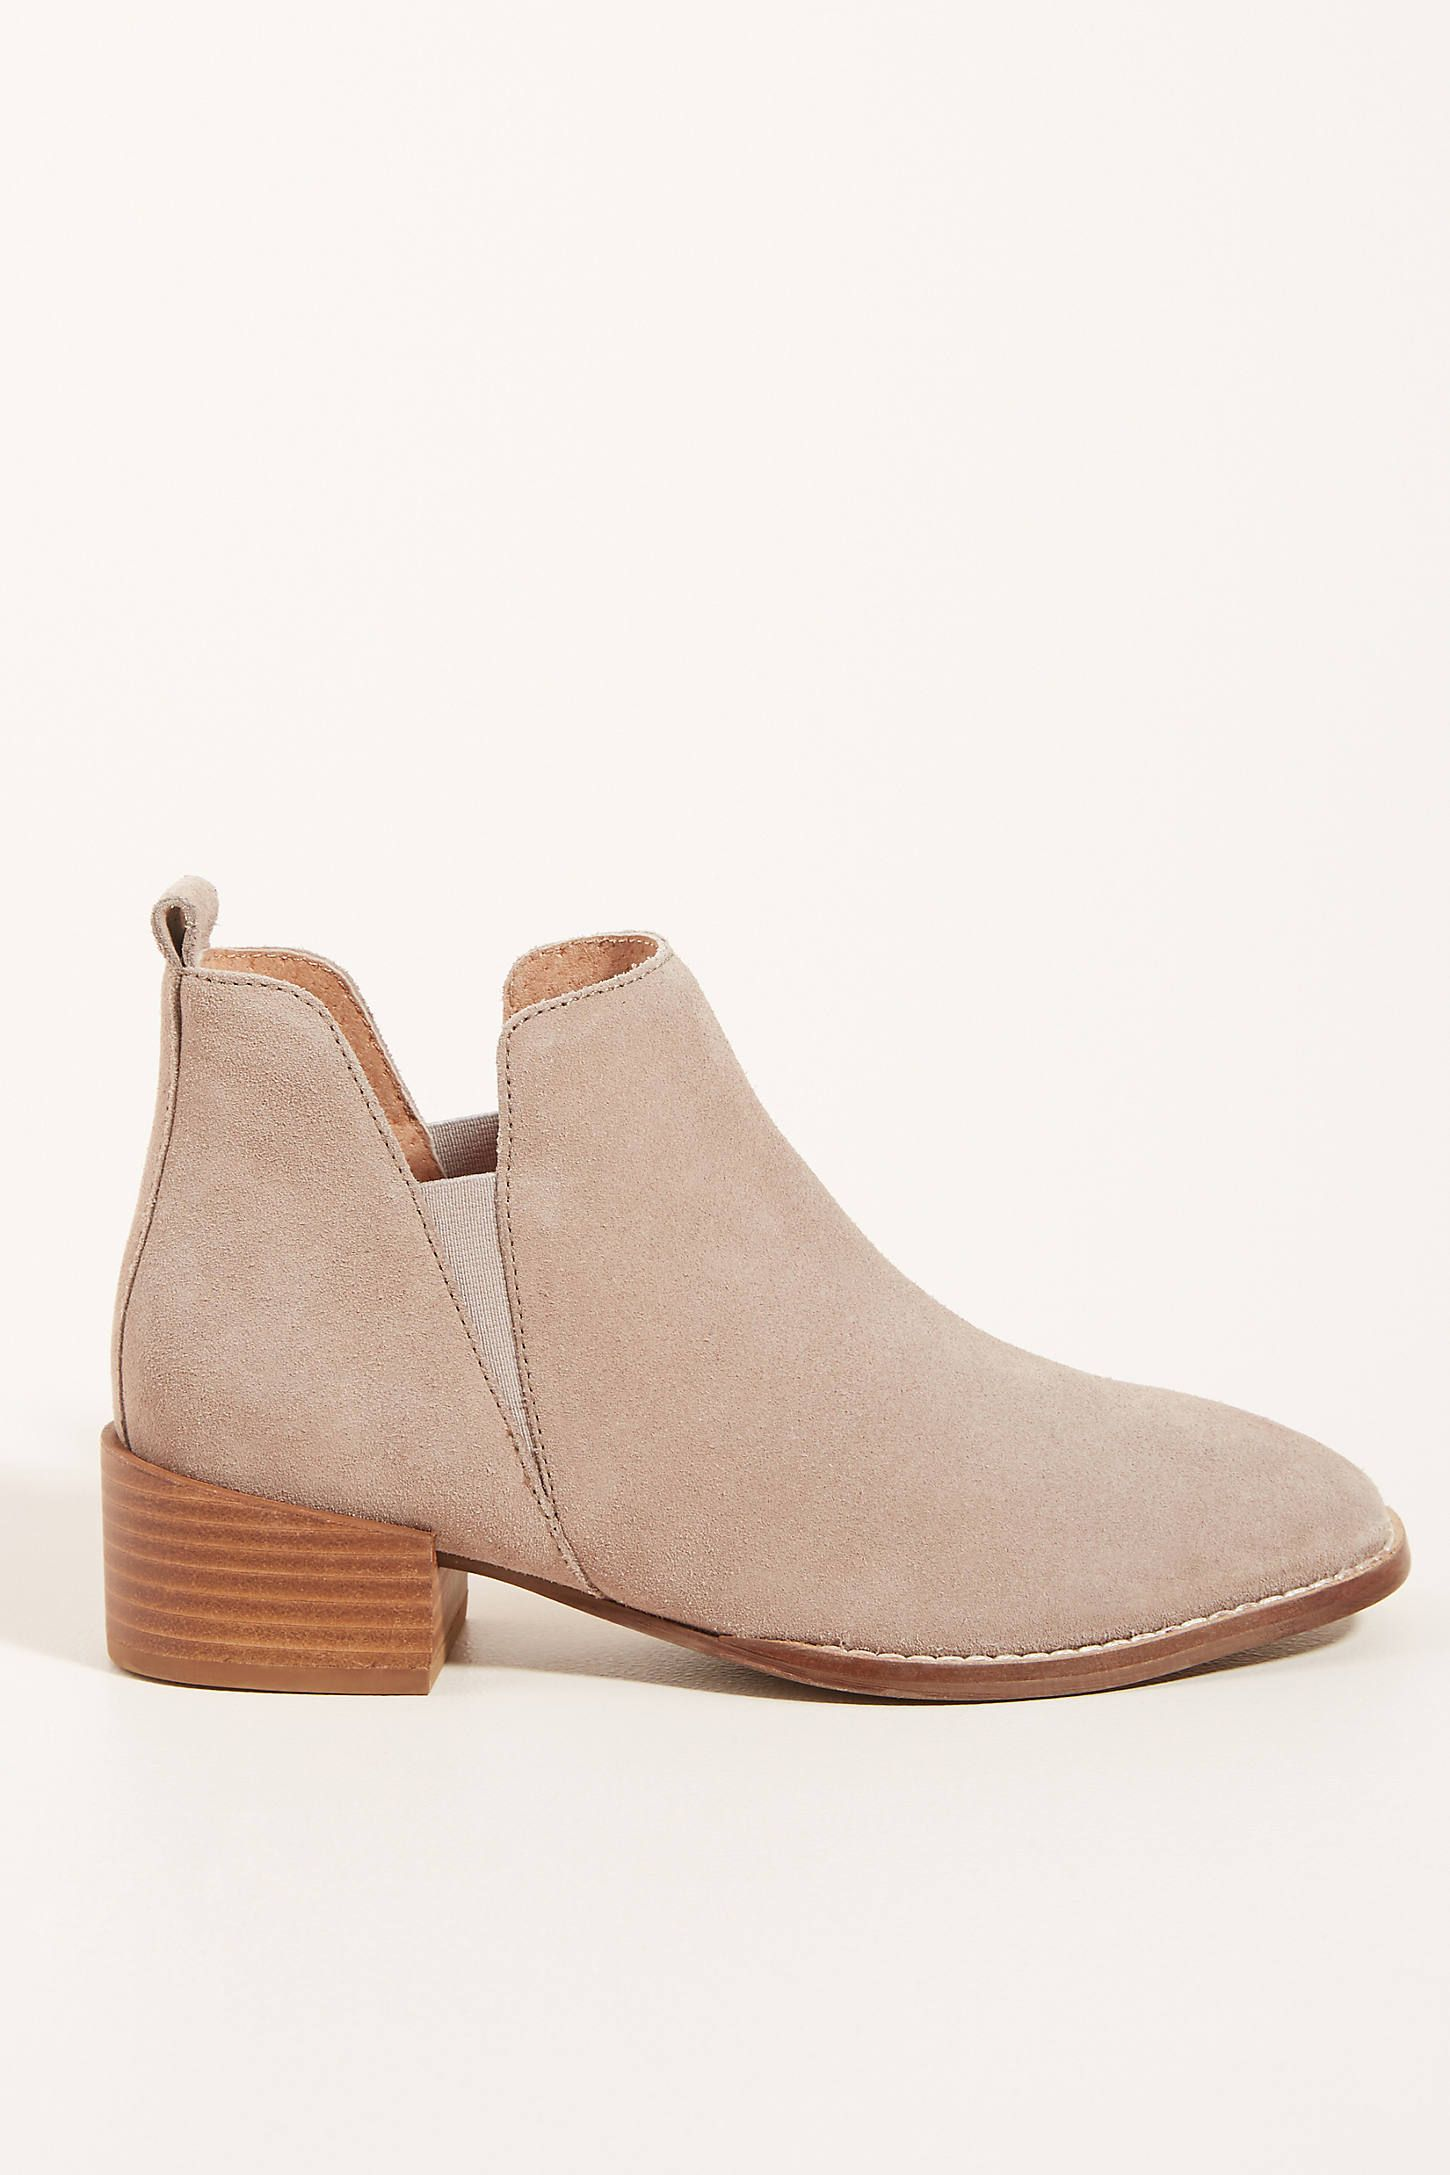 Seychelles Laila Ankle Boots